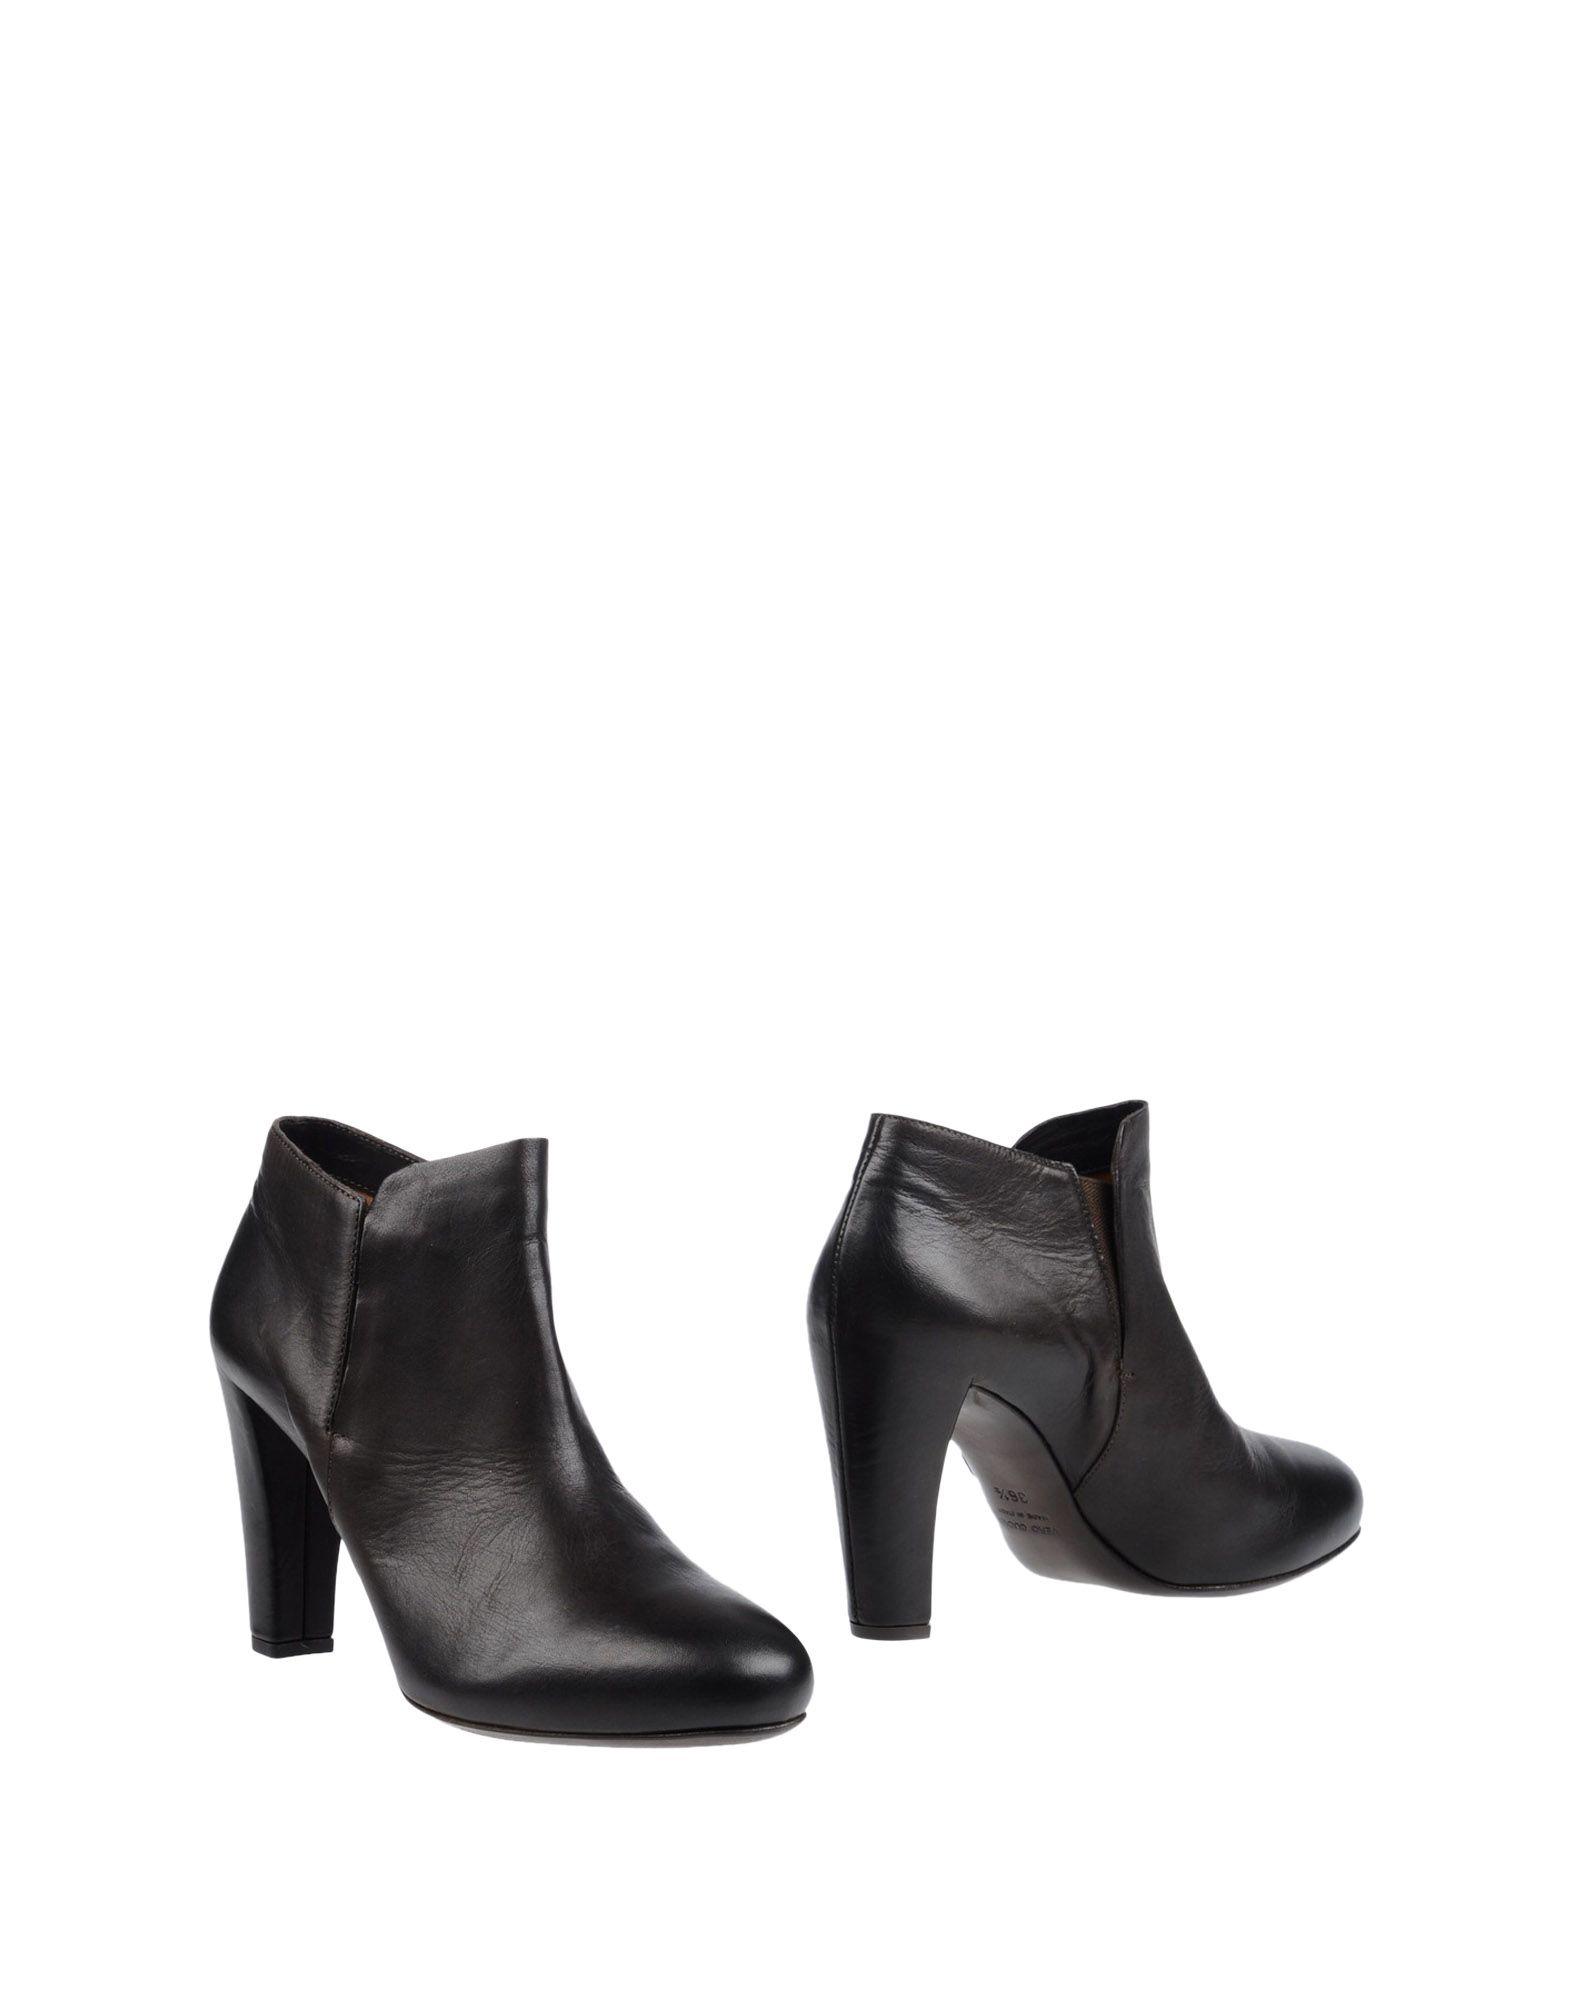 Roberto Del Carlo Stiefelette Damen  11250486TUGut aussehende strapazierfähige Schuhe